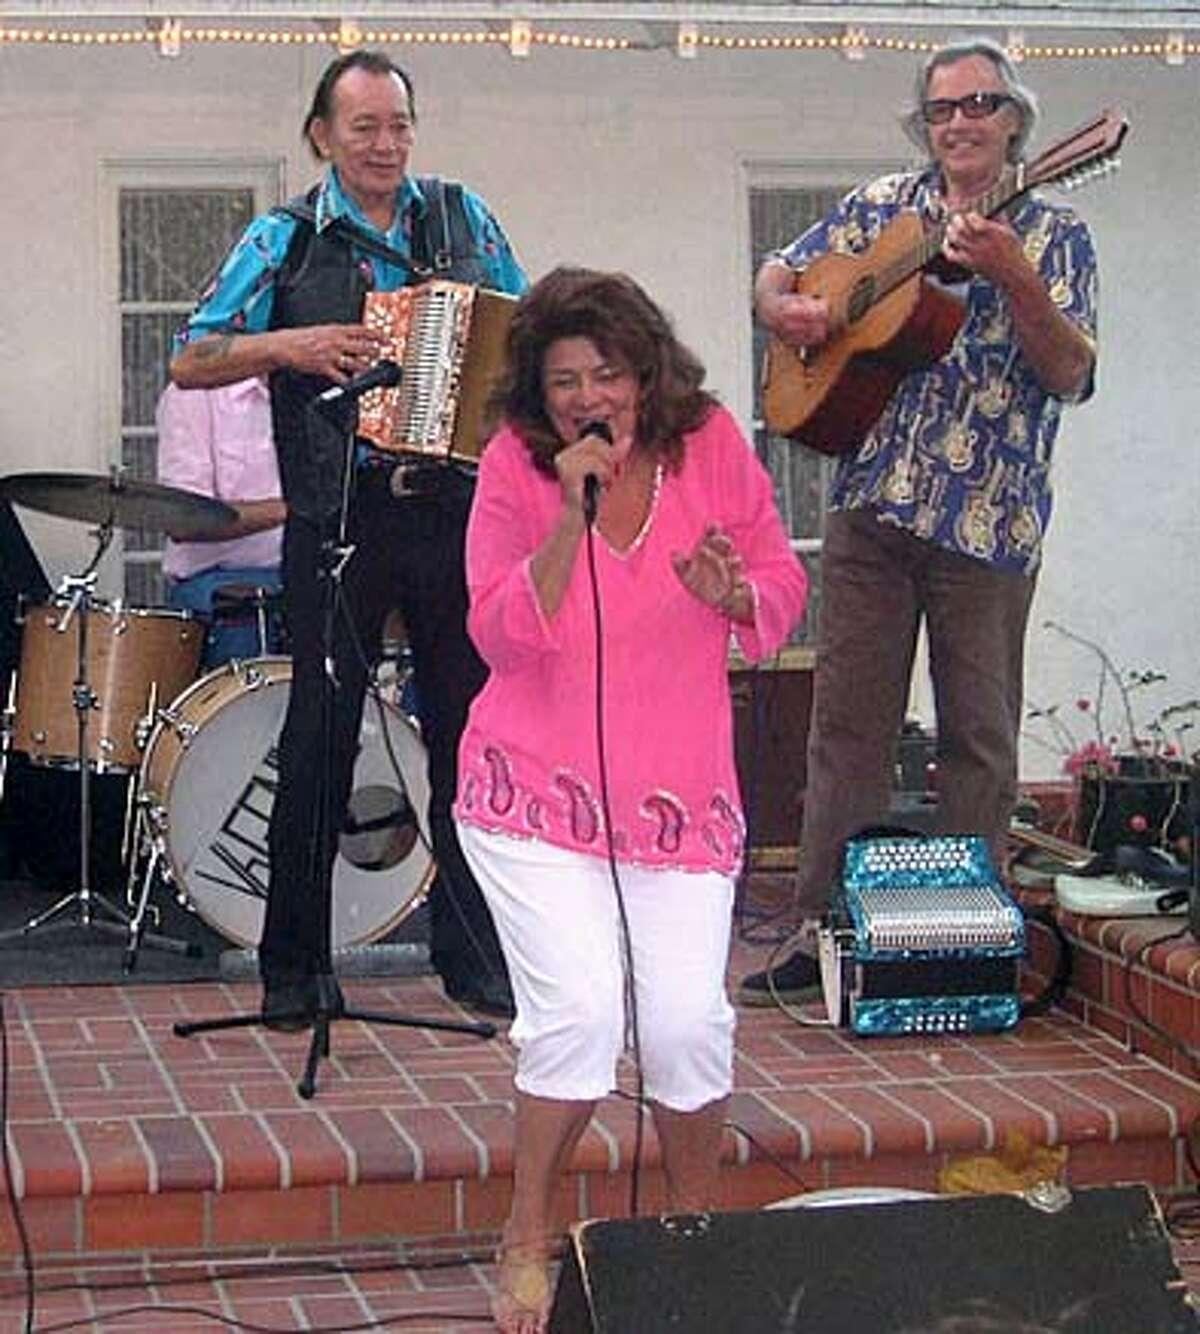 L-R: Flaco Jimenez, Rosella Arvizu, Ry Cooder.